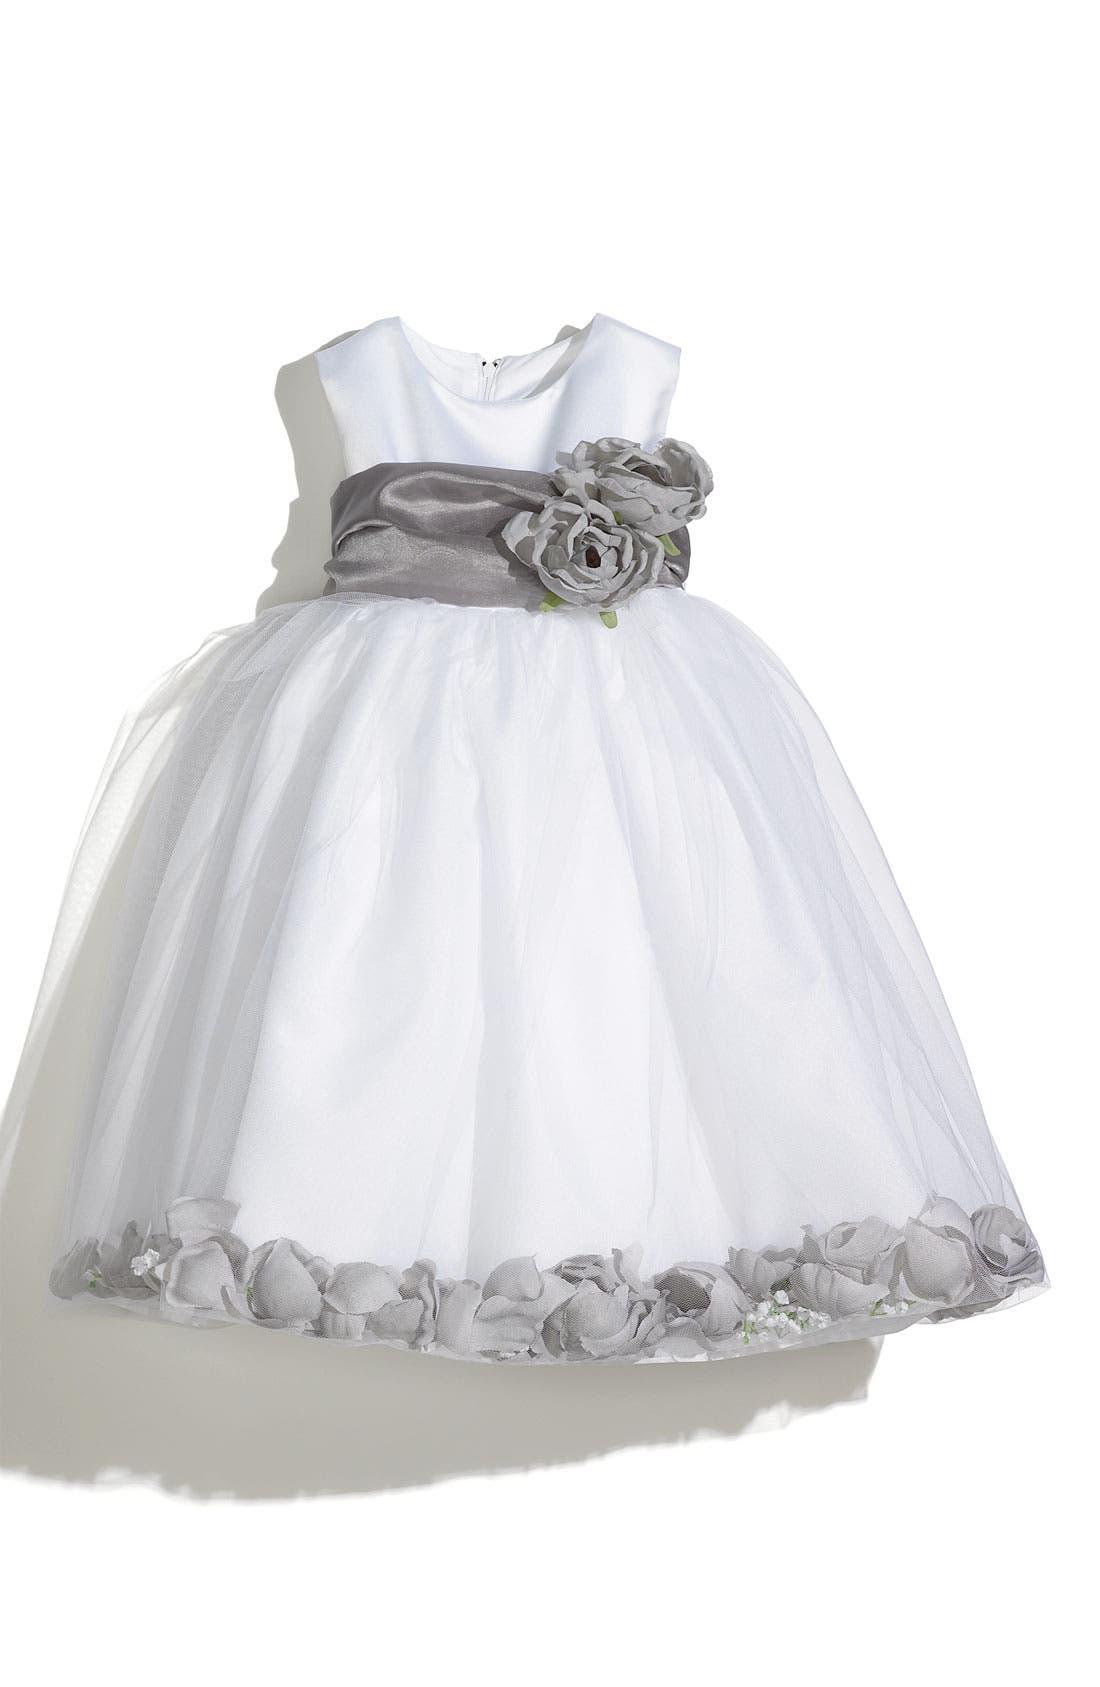 Alternate Image 1 Selected - Us Angels Petal Dress (Toddler Girls, Little Girls & Big Girls)